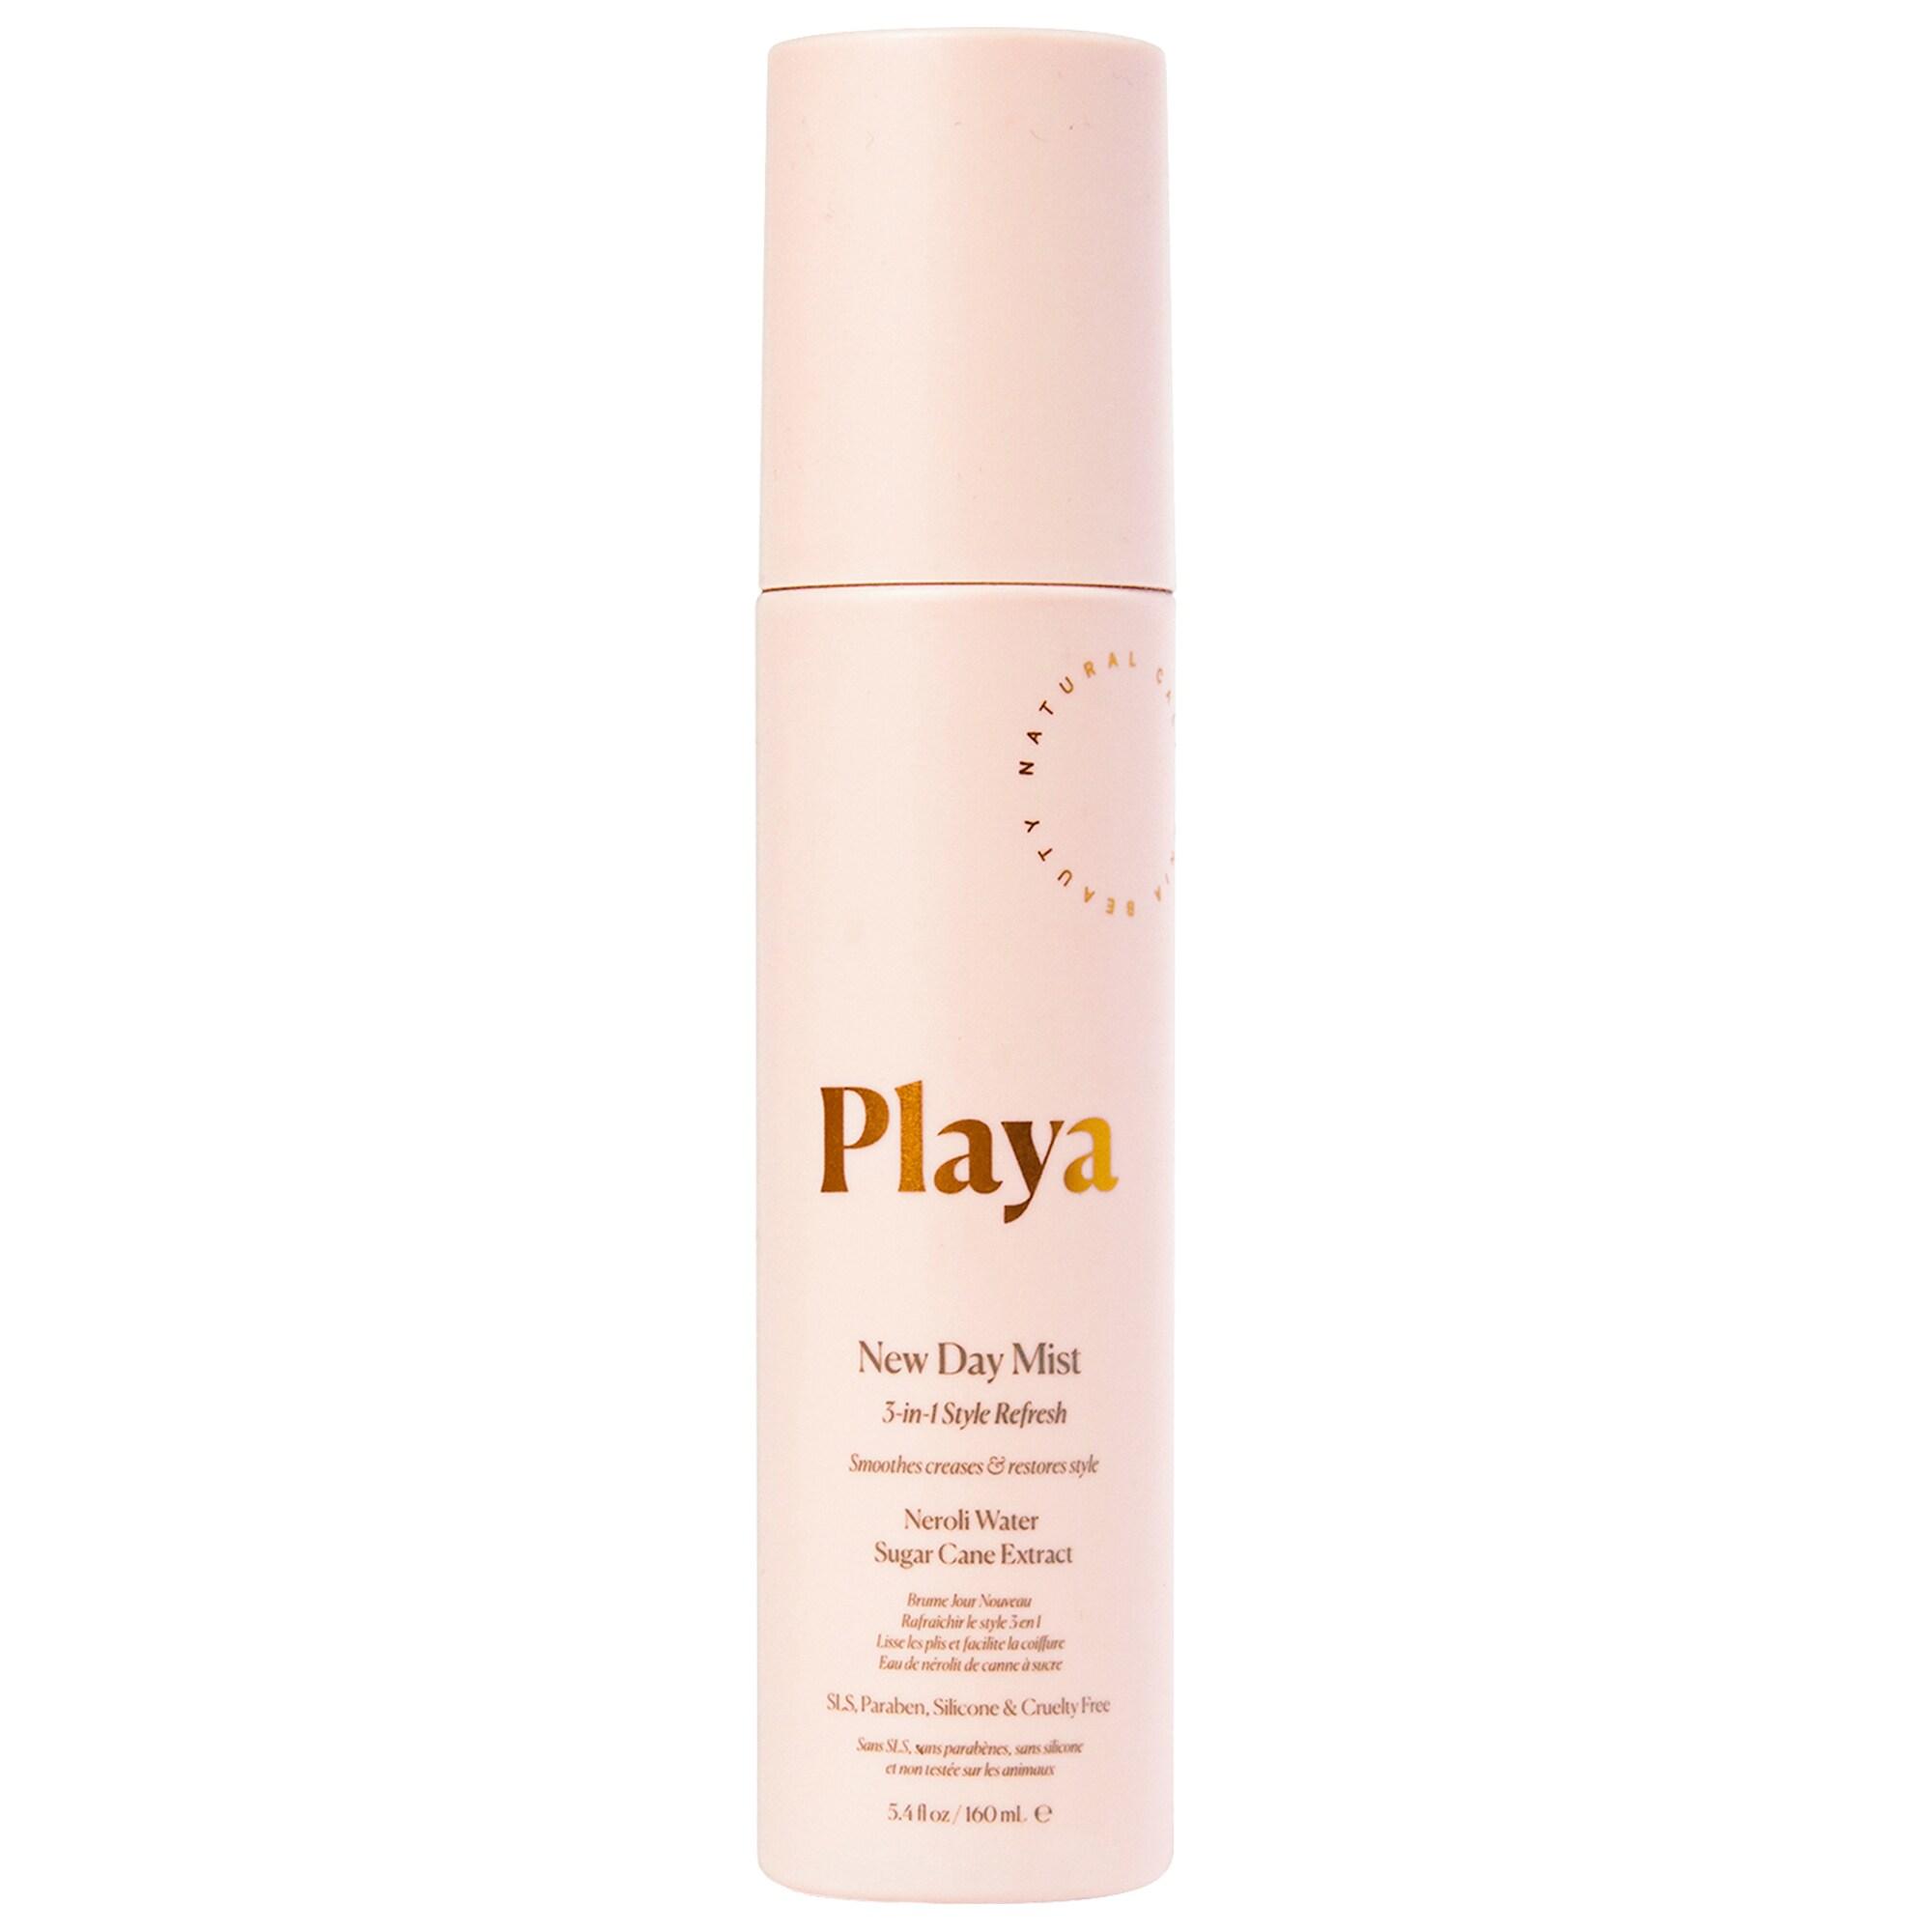 Playa - New Day Mist 3-in-1 Styler Refresh